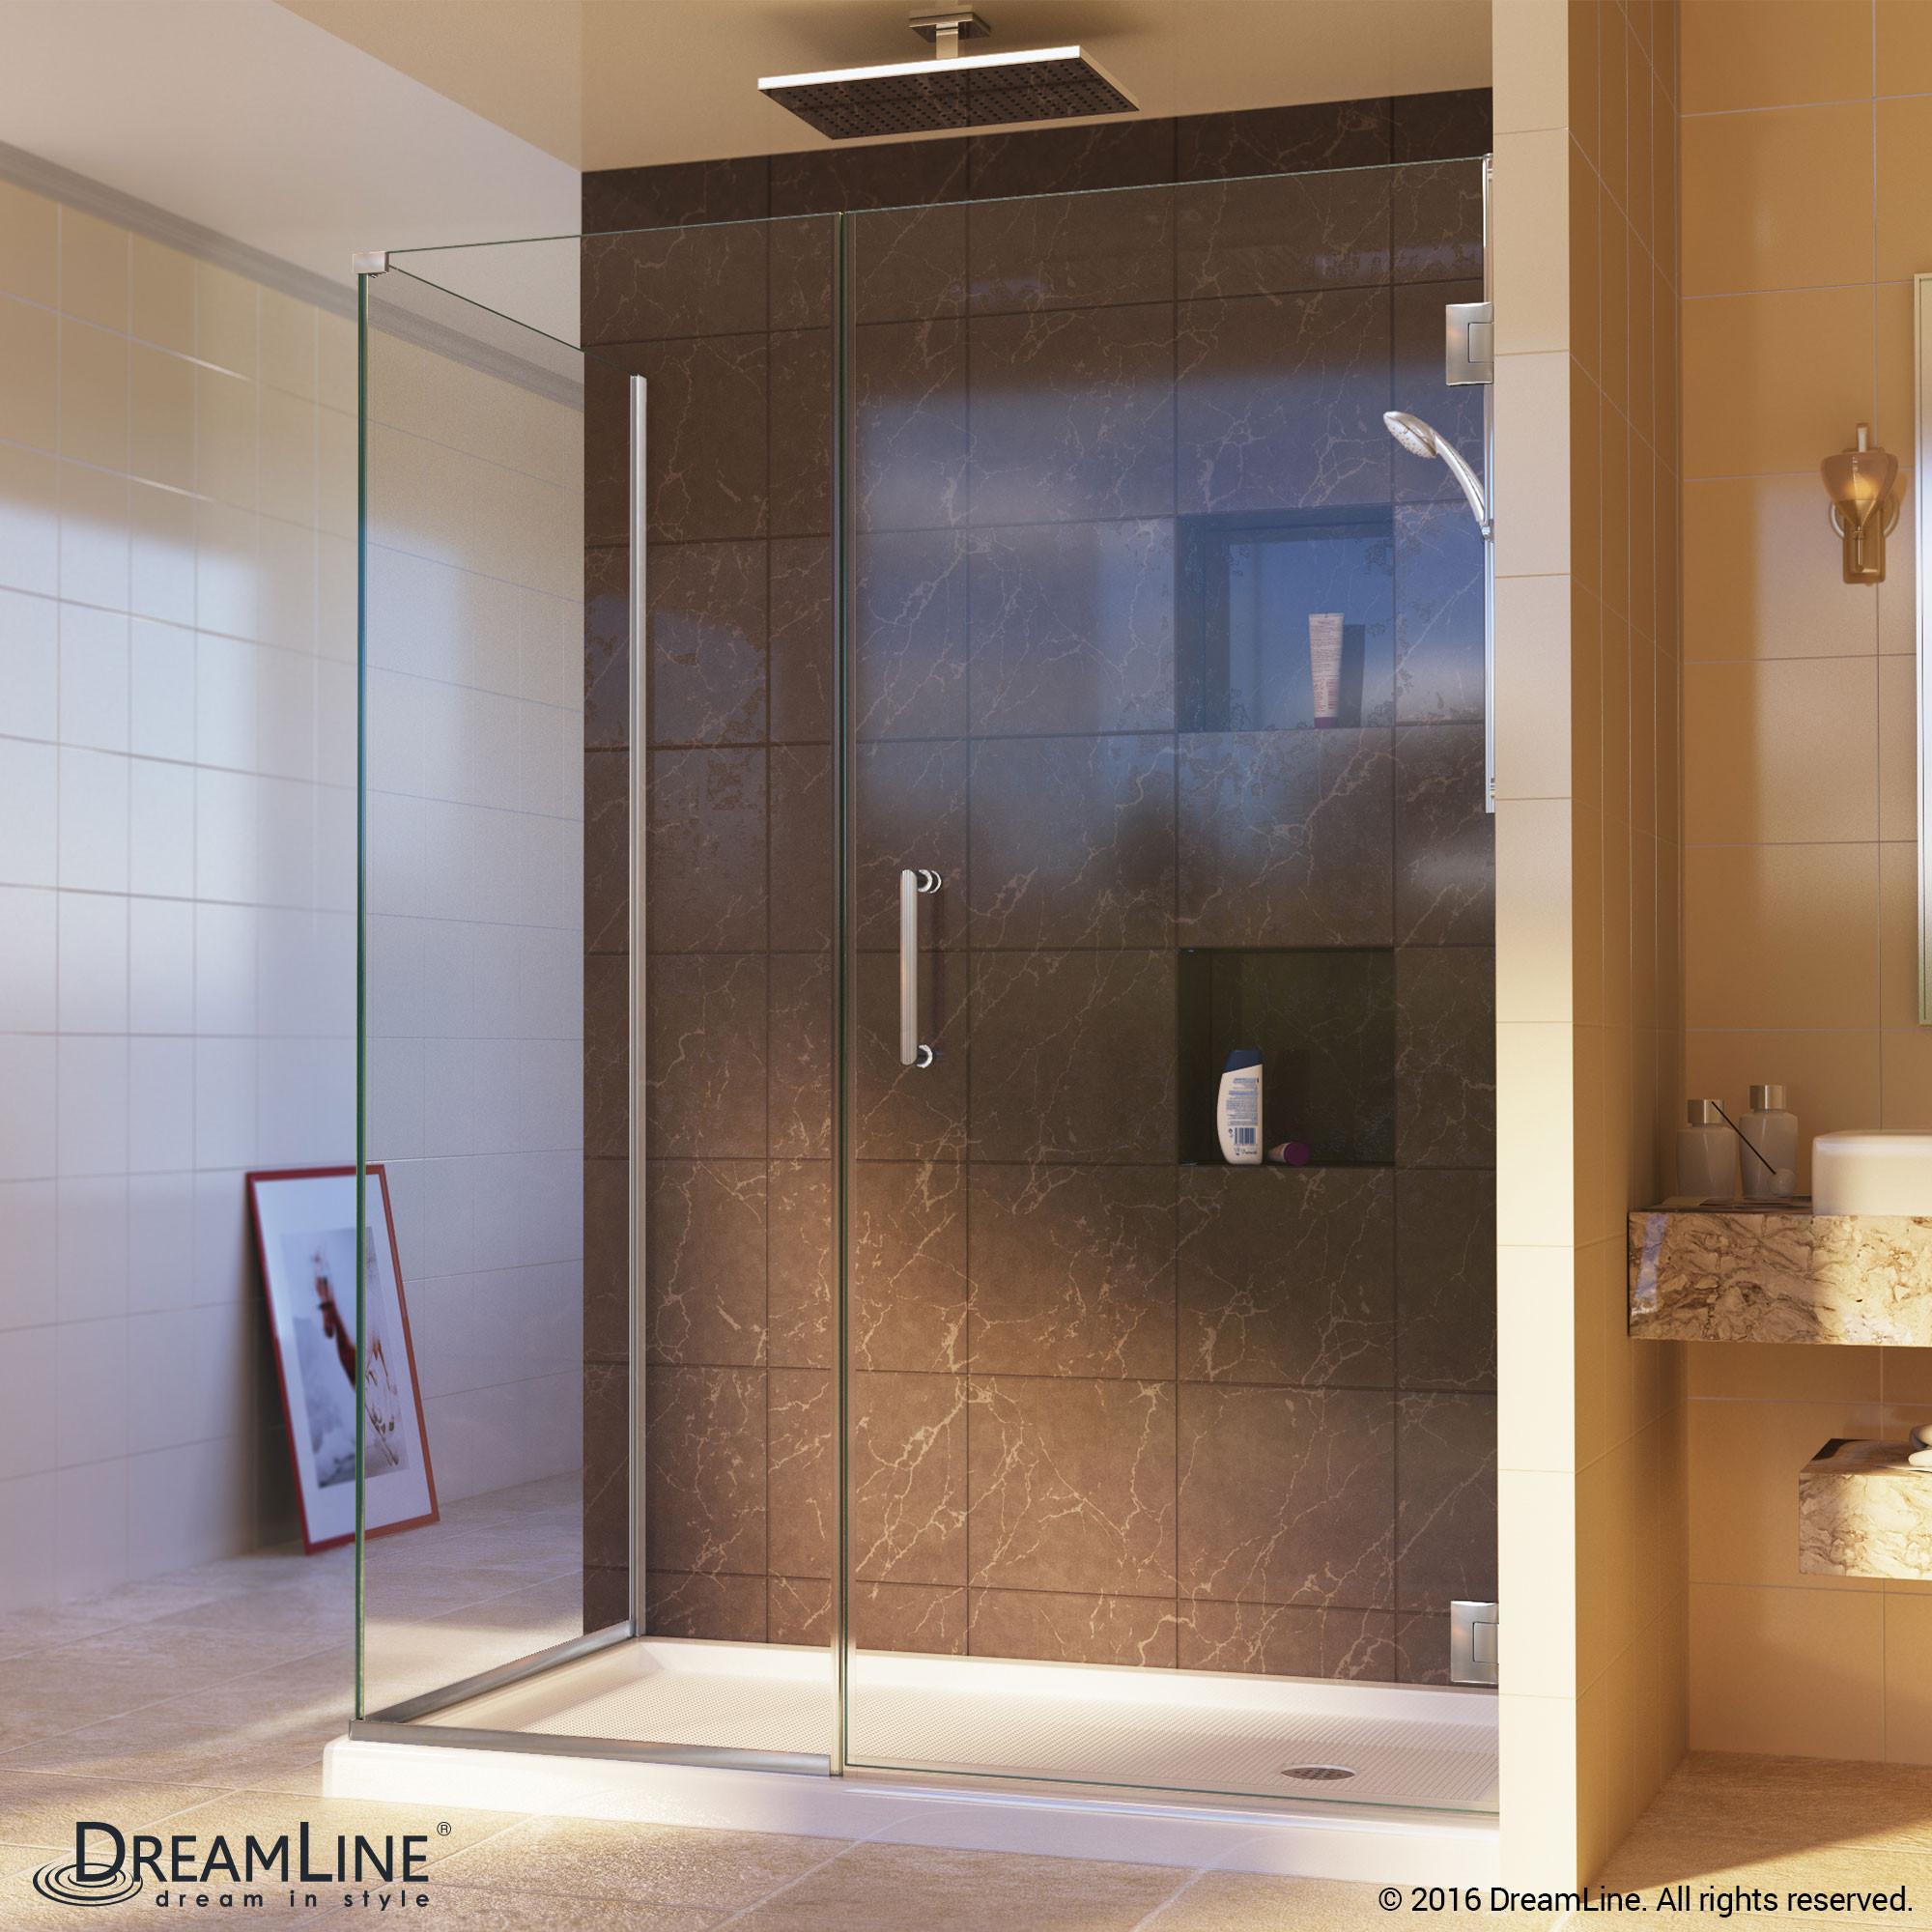 DreamLine SHEN-24400340-04 Unidoor Plus Hinged Shower Enclosure In Brushed Nickel Finish Hardware